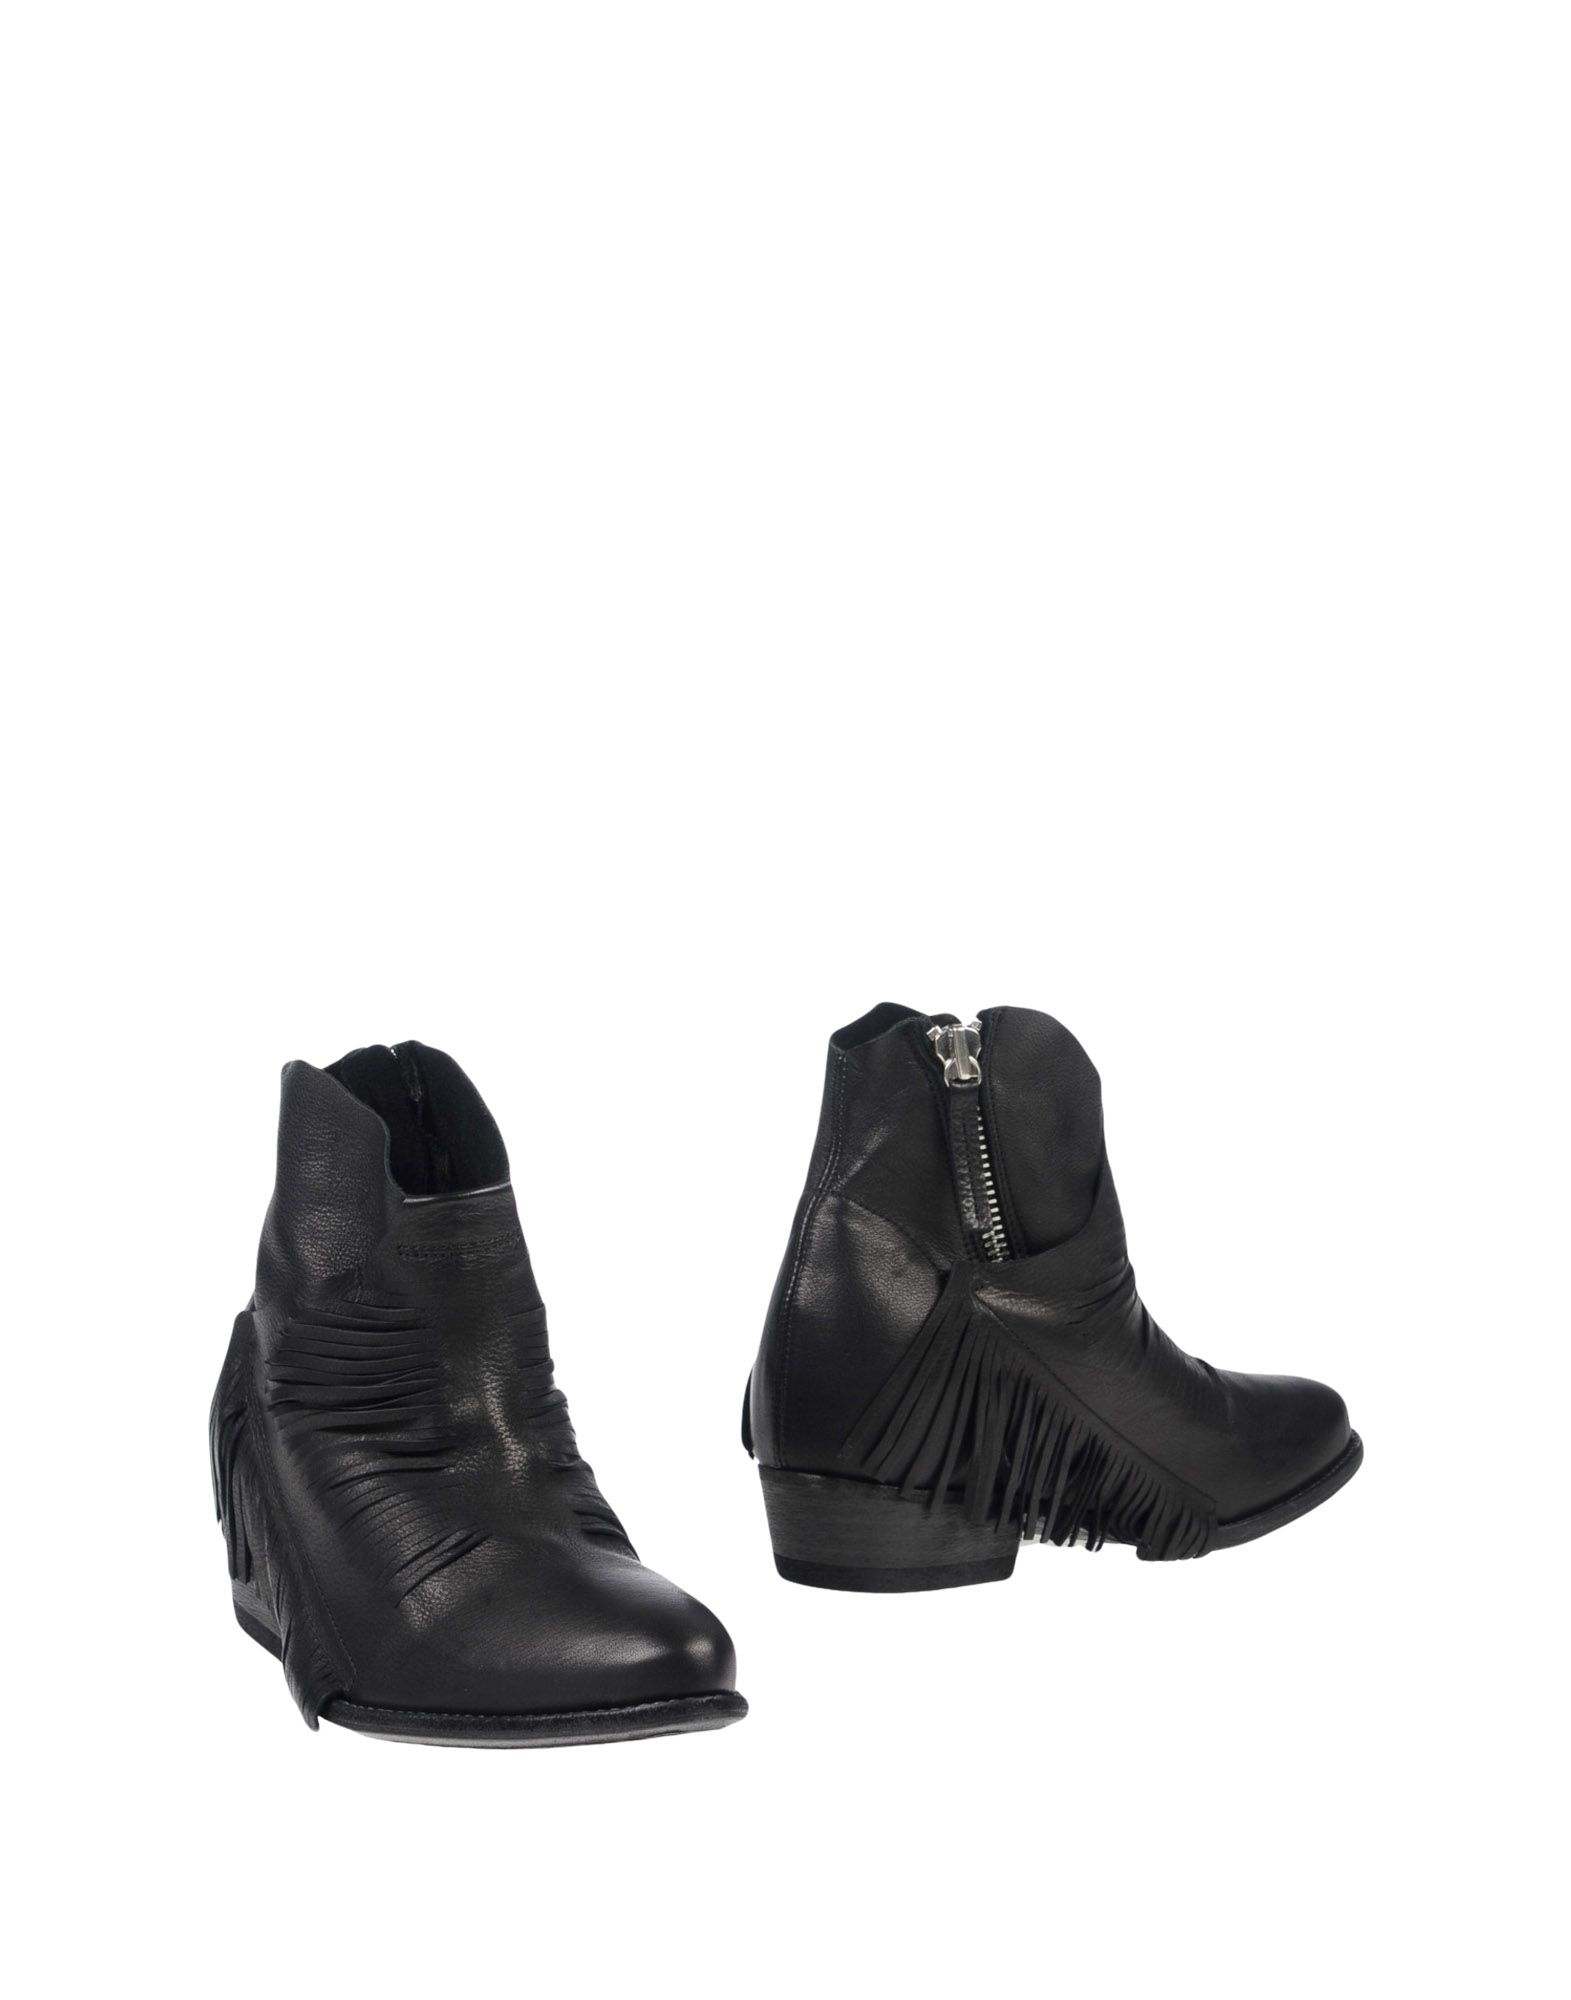 Cinzia Araia Stiefelette 11418558BU Damen  11418558BU Stiefelette Neue Schuhe 79914f